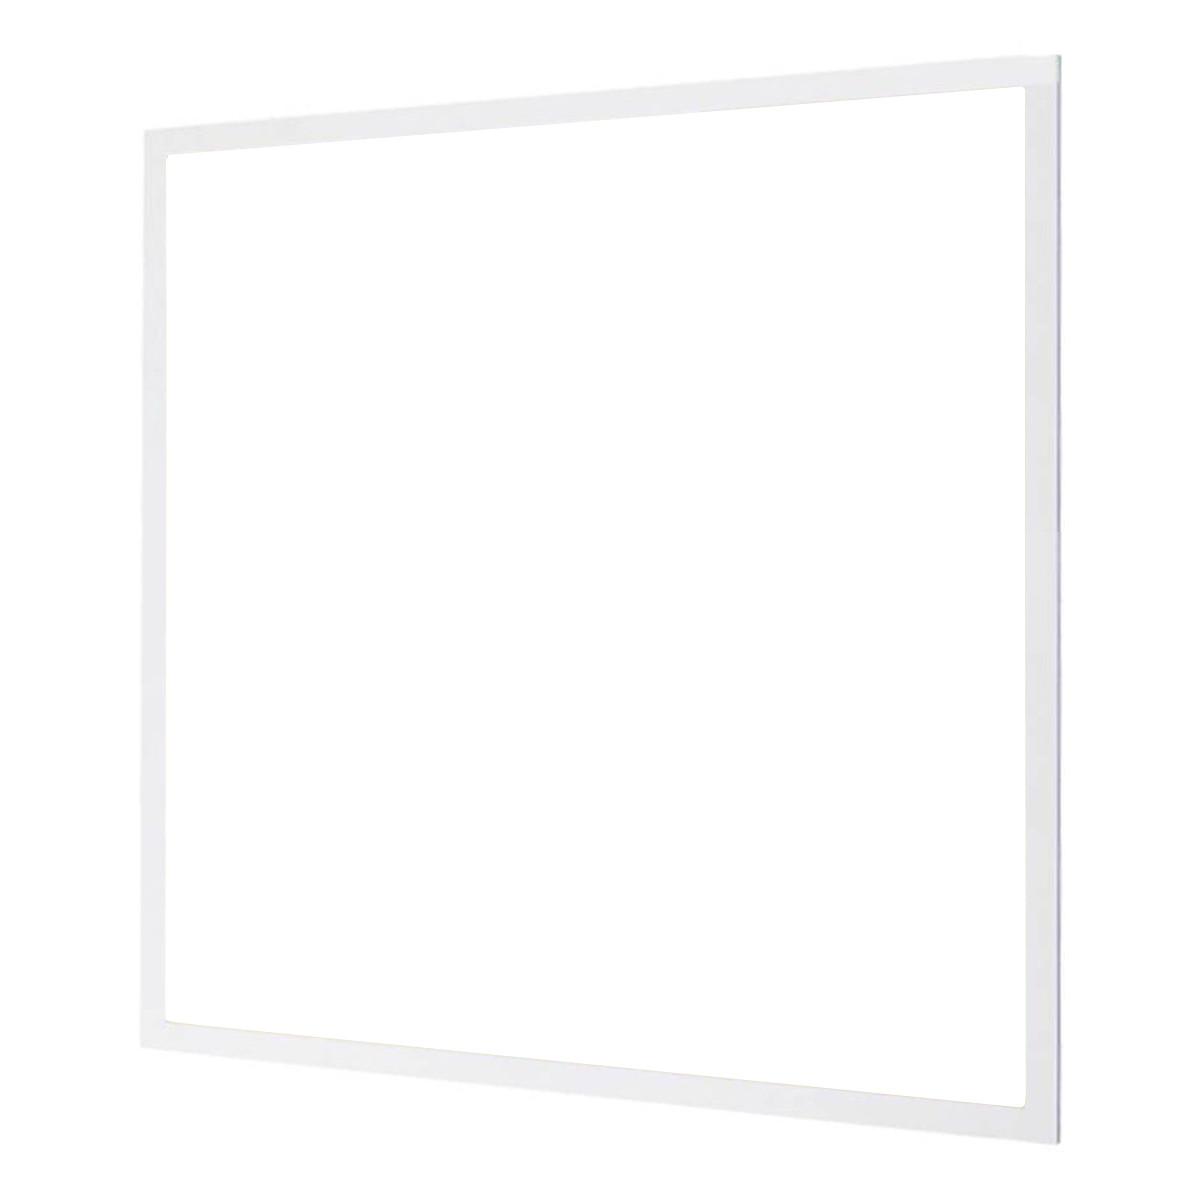 LED Paneel - Aigi - 60x60 Helder/Koud Wit 6000K - 32W High Lumen - Inbouw Vierkant - Inclusief Stekk